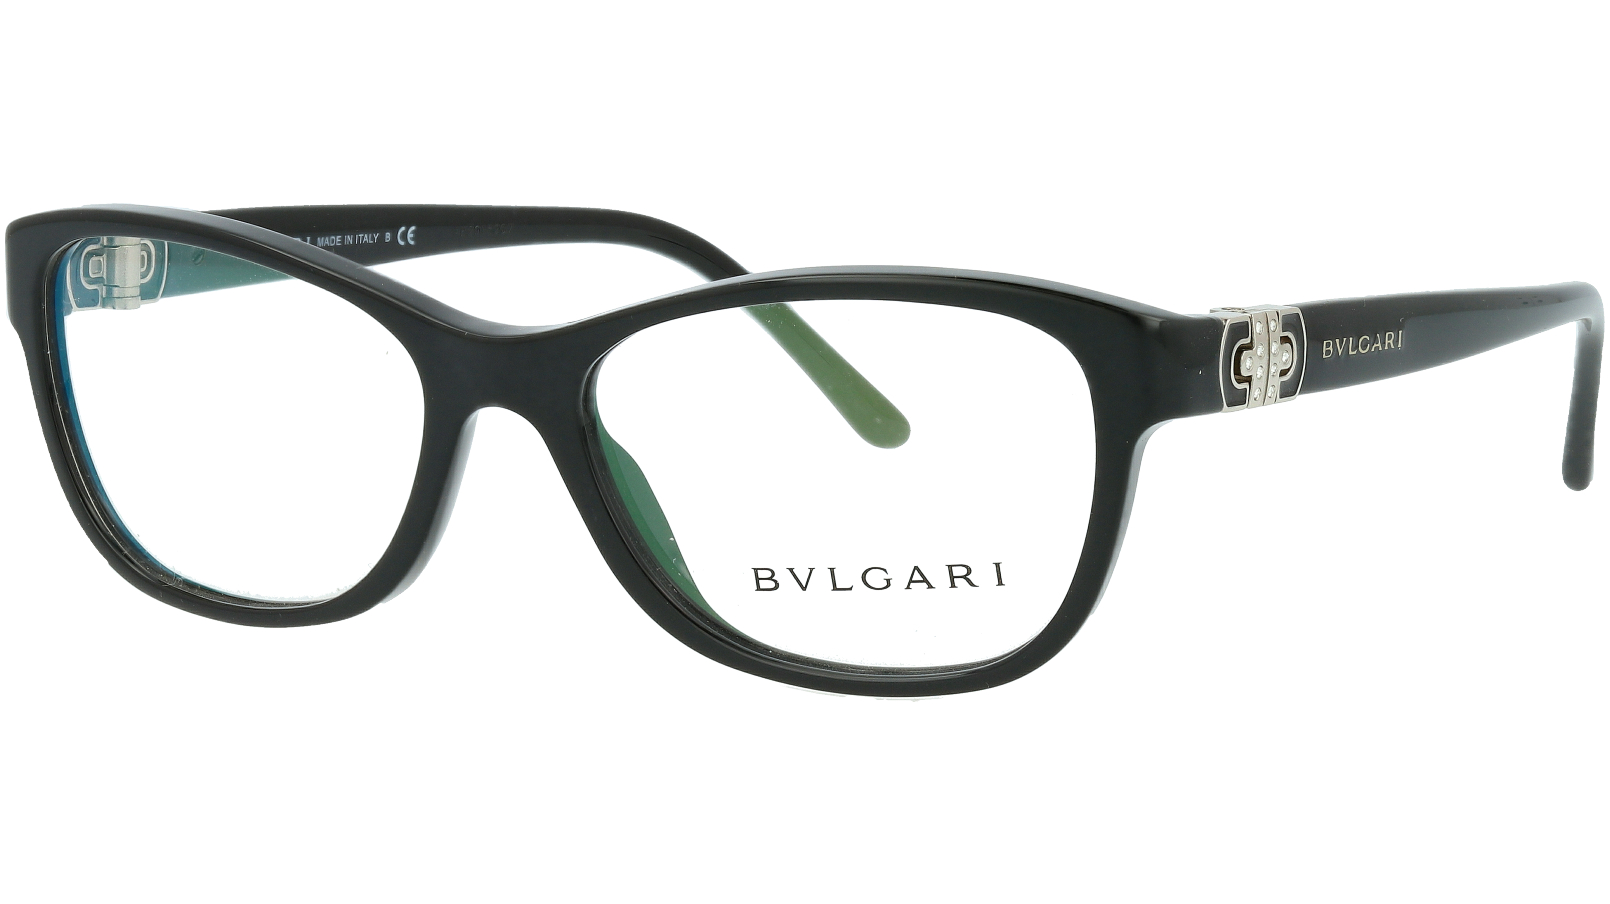 Bvlgari BV4082B 501 52 Black Glasses